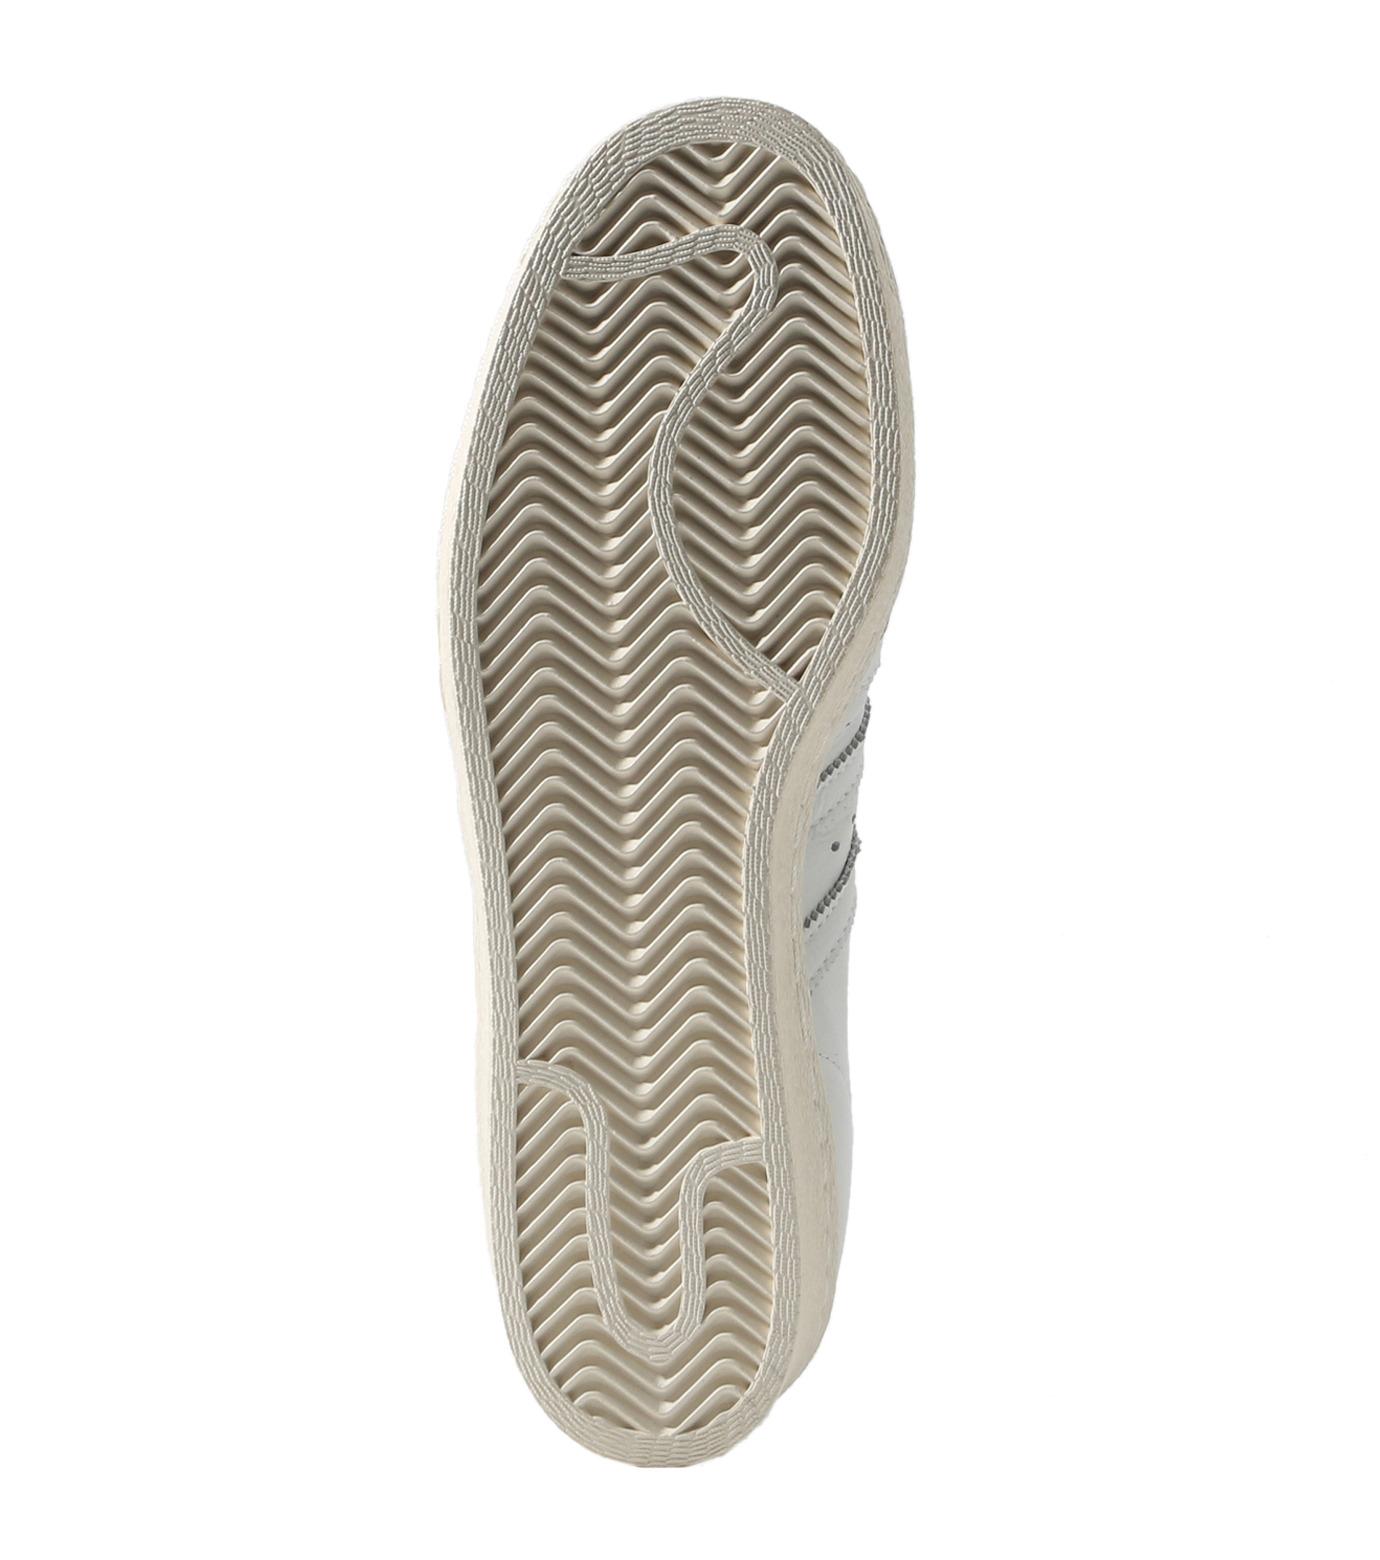 adidas(アディダス)のSUPERSTAR 80s DLX-WHITE(シューズ/shoes)-S75016-4 拡大詳細画像2